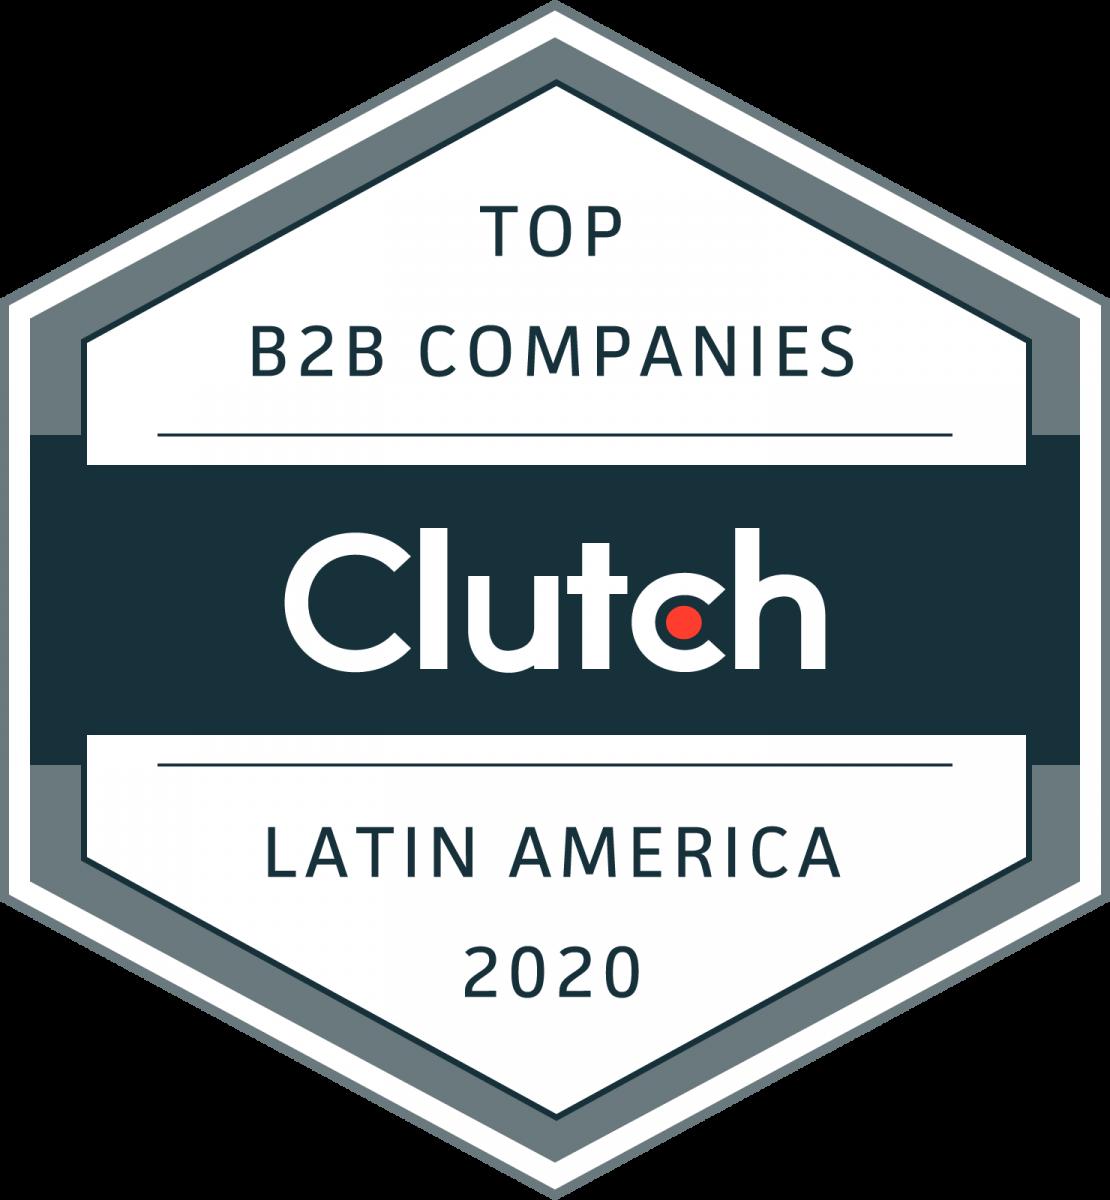 2020 Latin America B2B